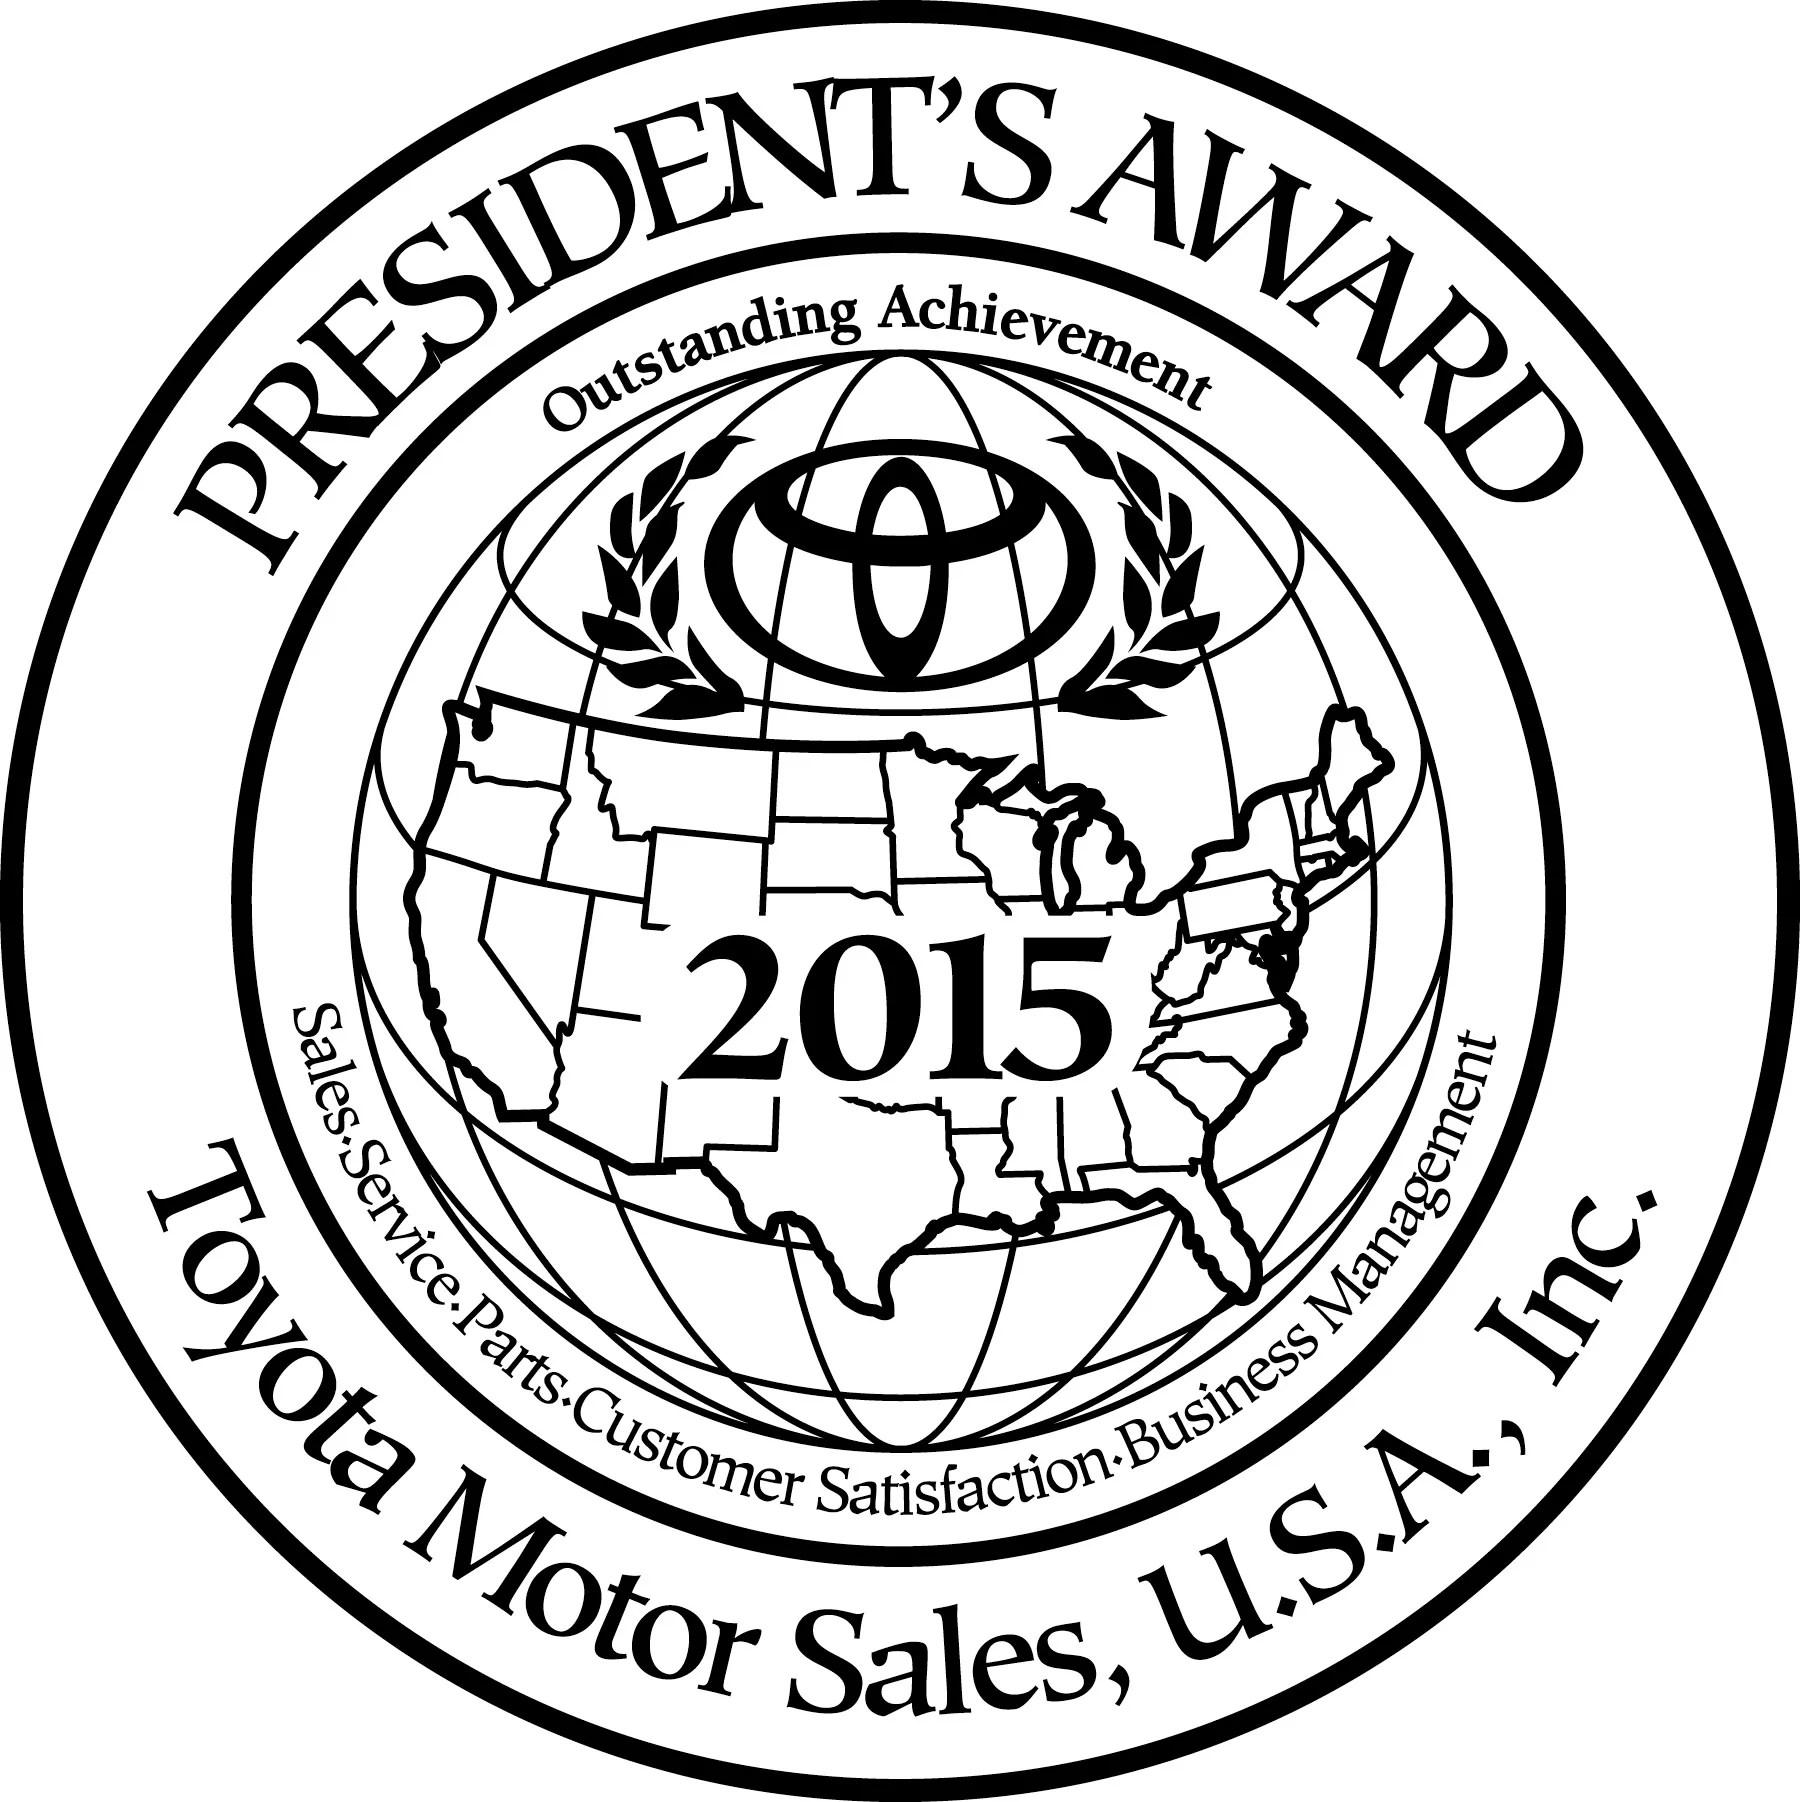 Hoffman Toyota Ct Car Dealer Serving Avon Hartford